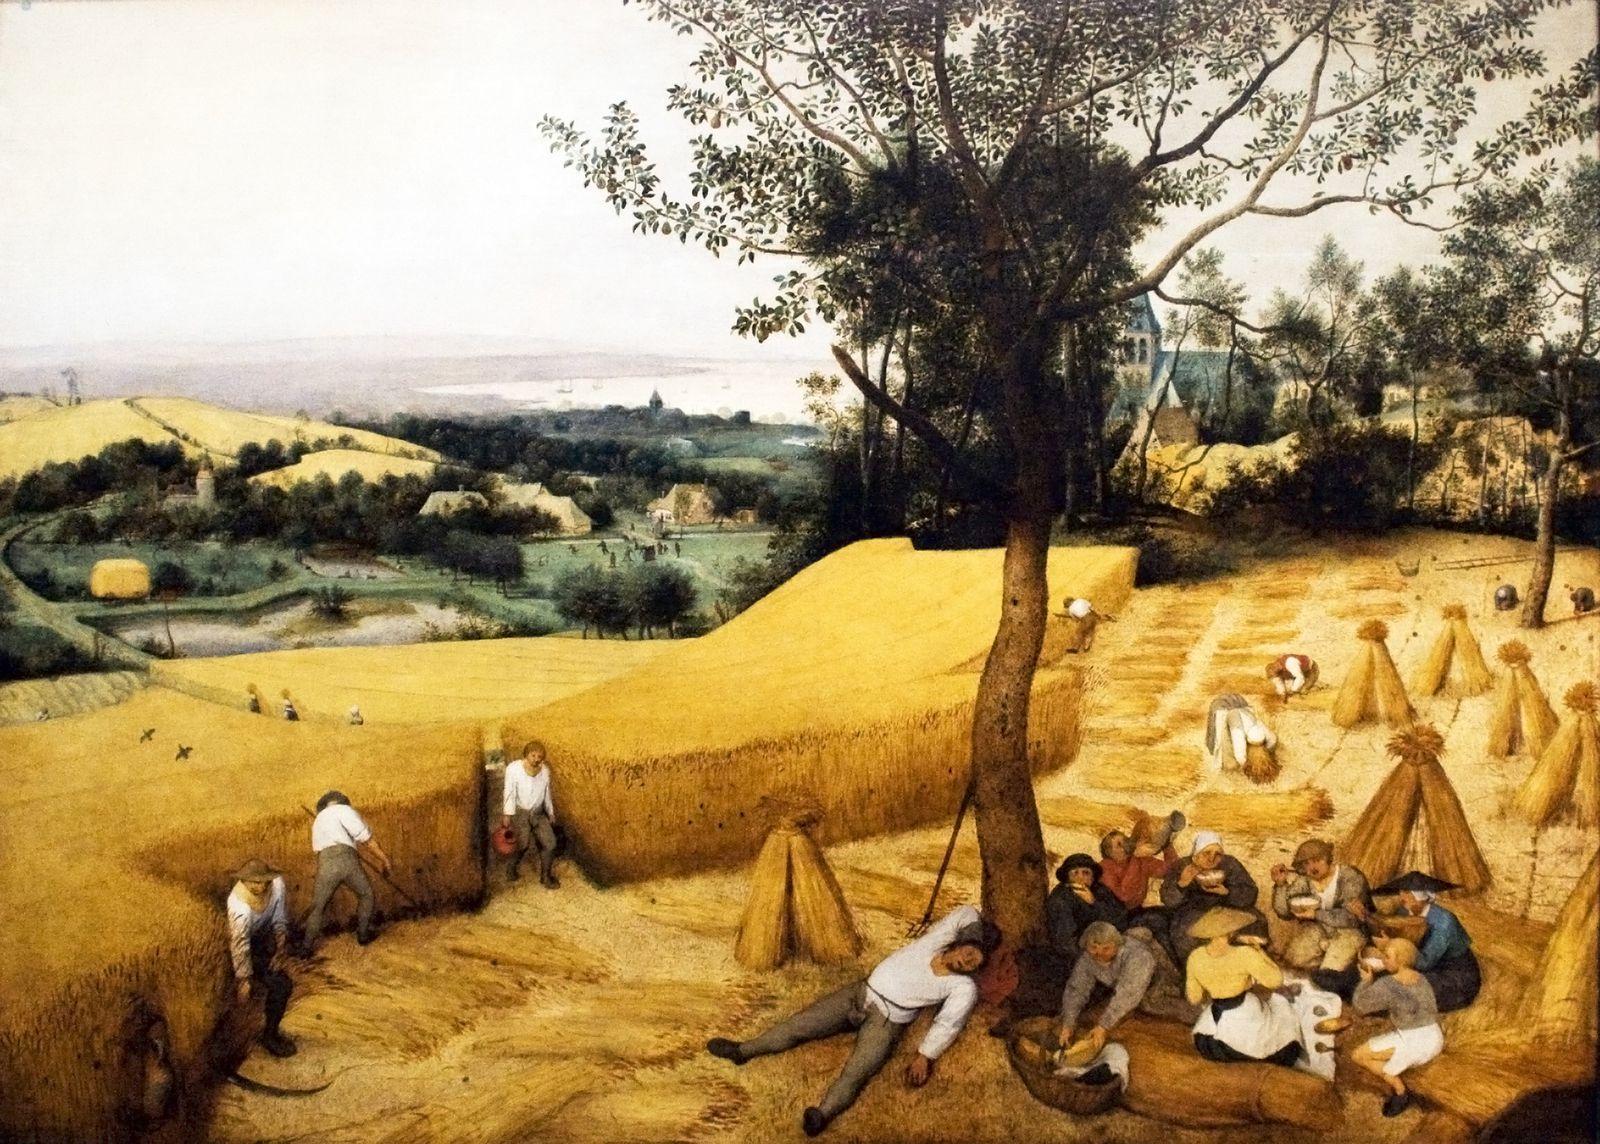 La moisson par Pieter Brueghel (1565)